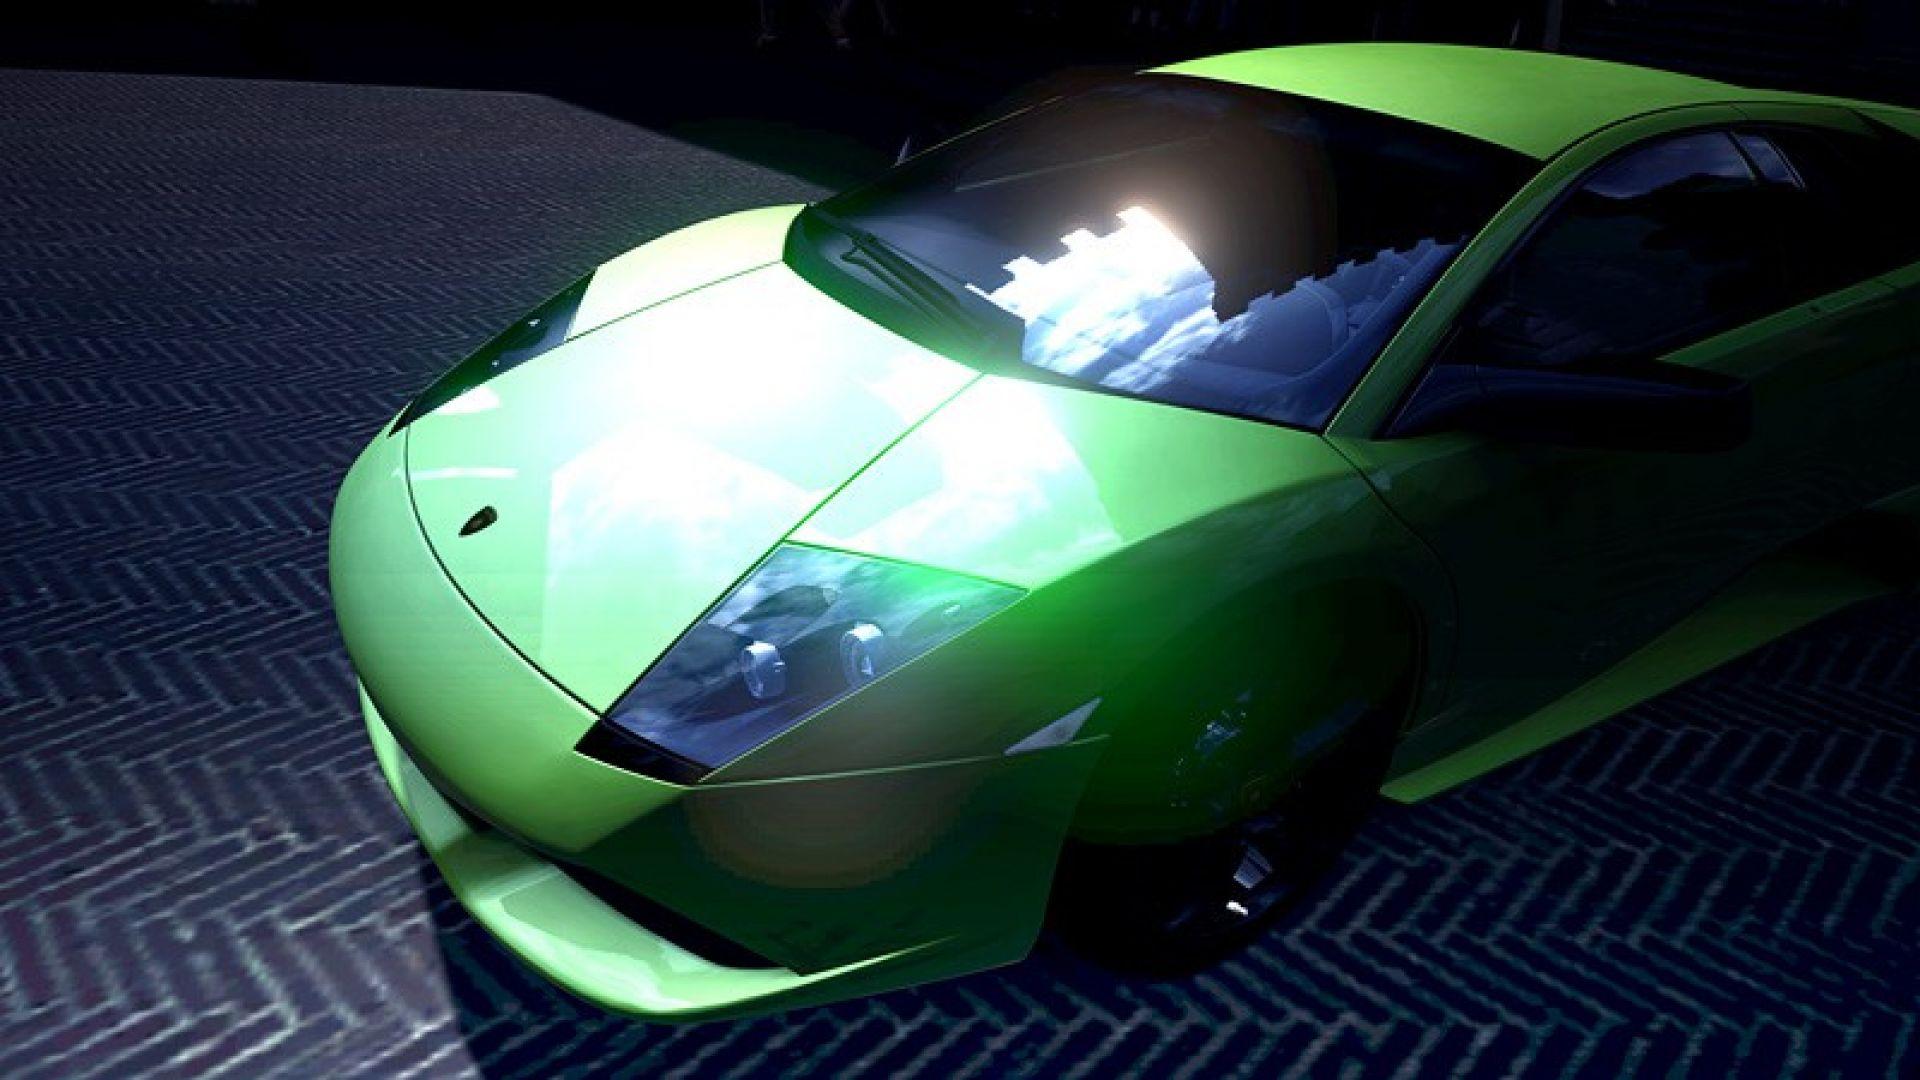 313688-16x9-lg Remarkable Lotus Carlton Gran Turismo 5 Cars Trend